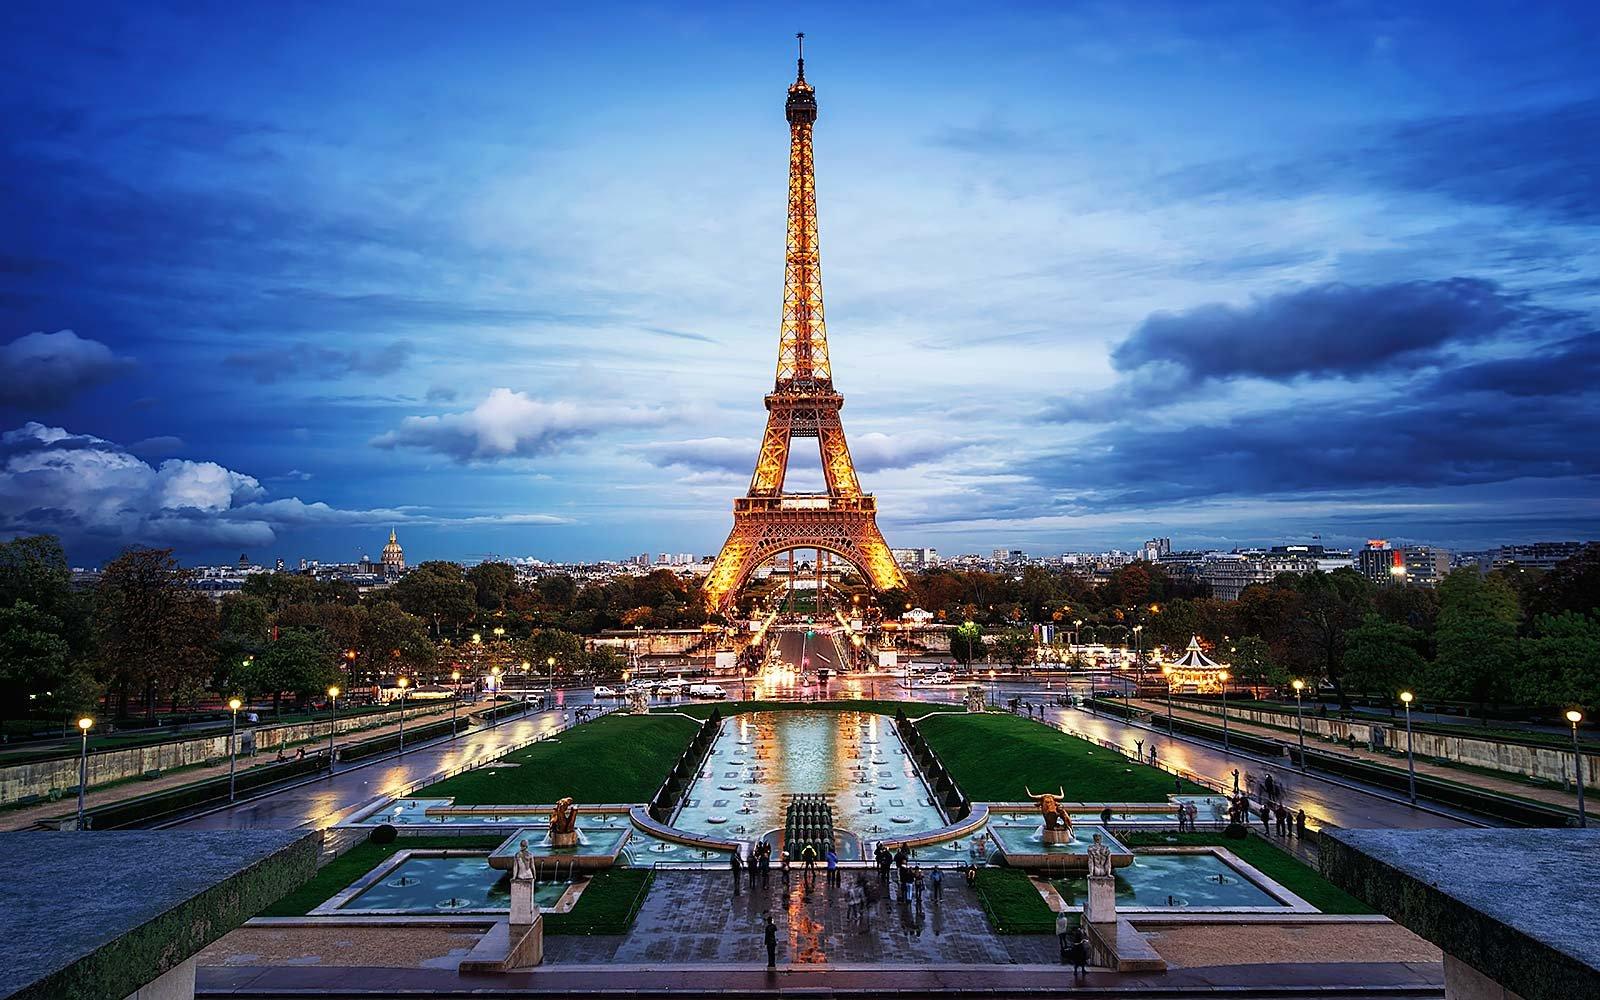 Paris by Eurostar - Valentines Day Trip for 72pp Return - 12 Hours in Paris!